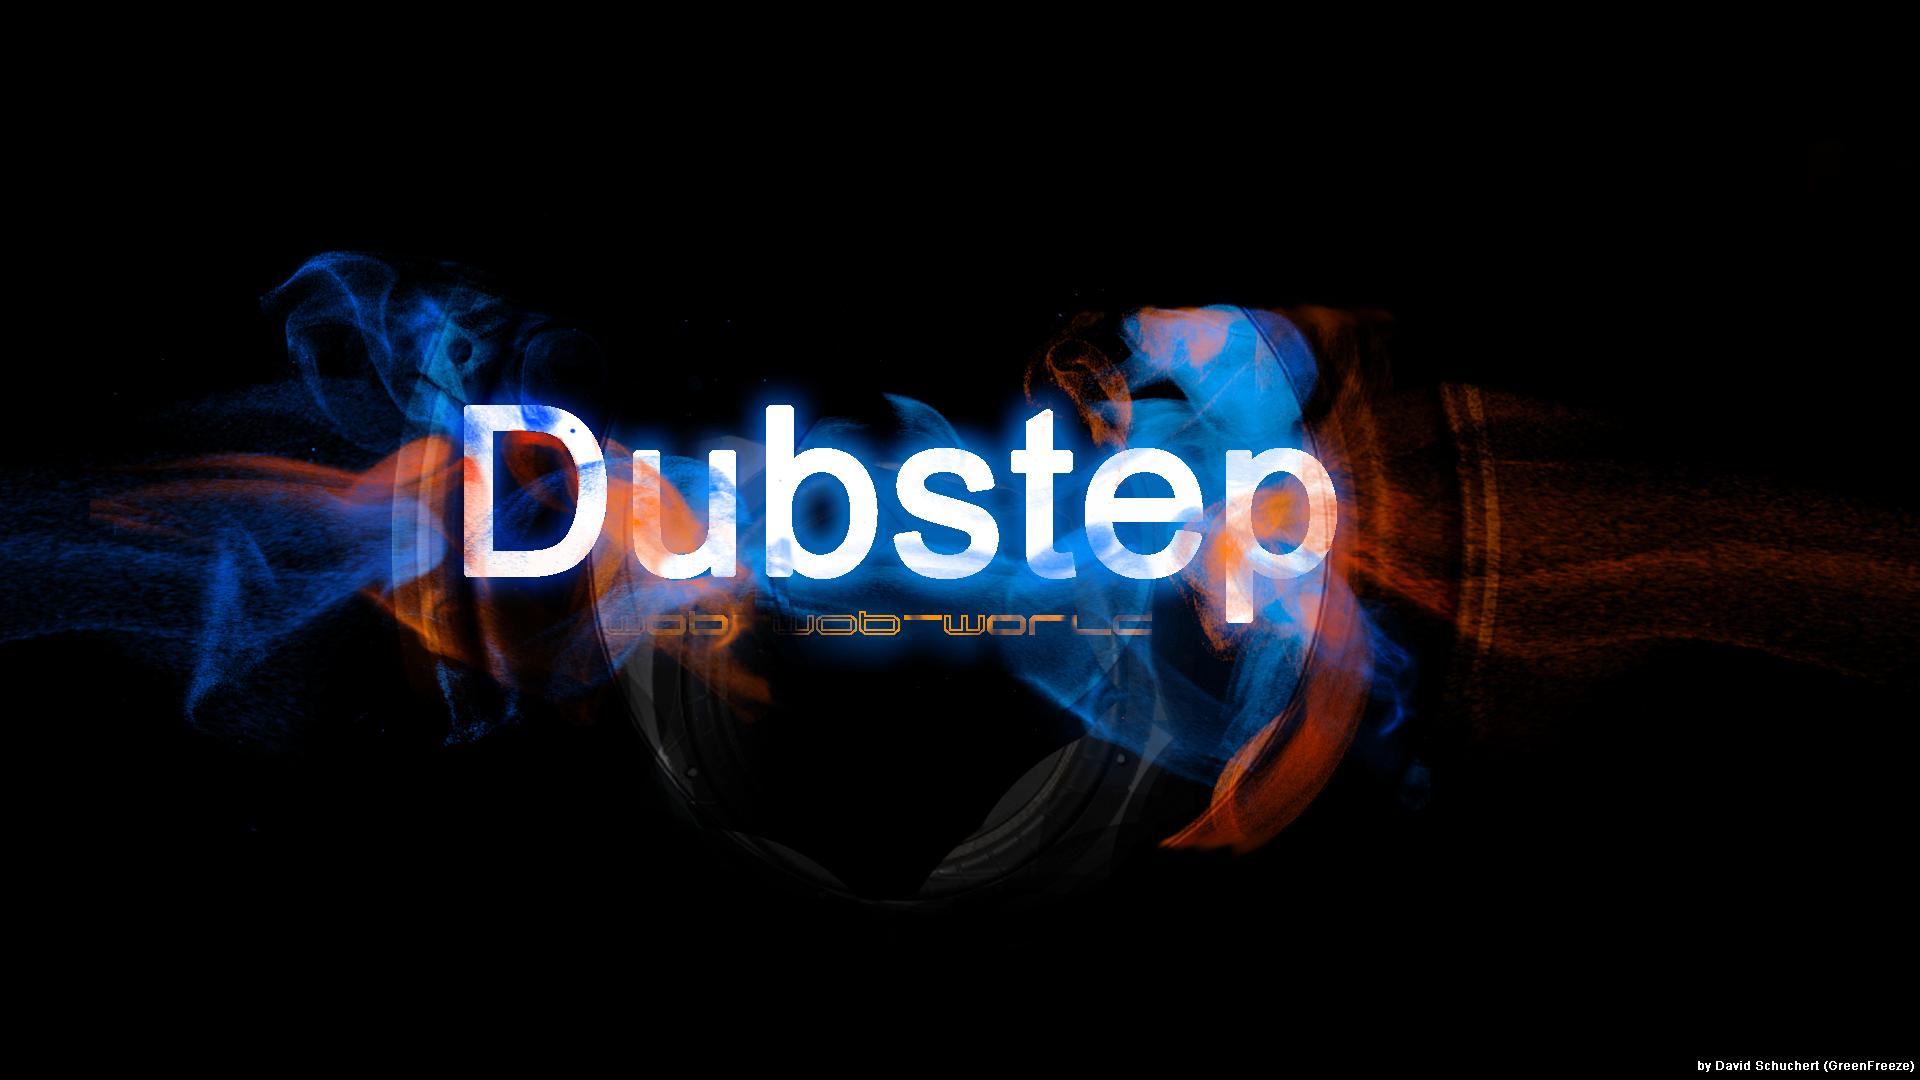 графика dubstep музыка  № 2880852 бесплатно